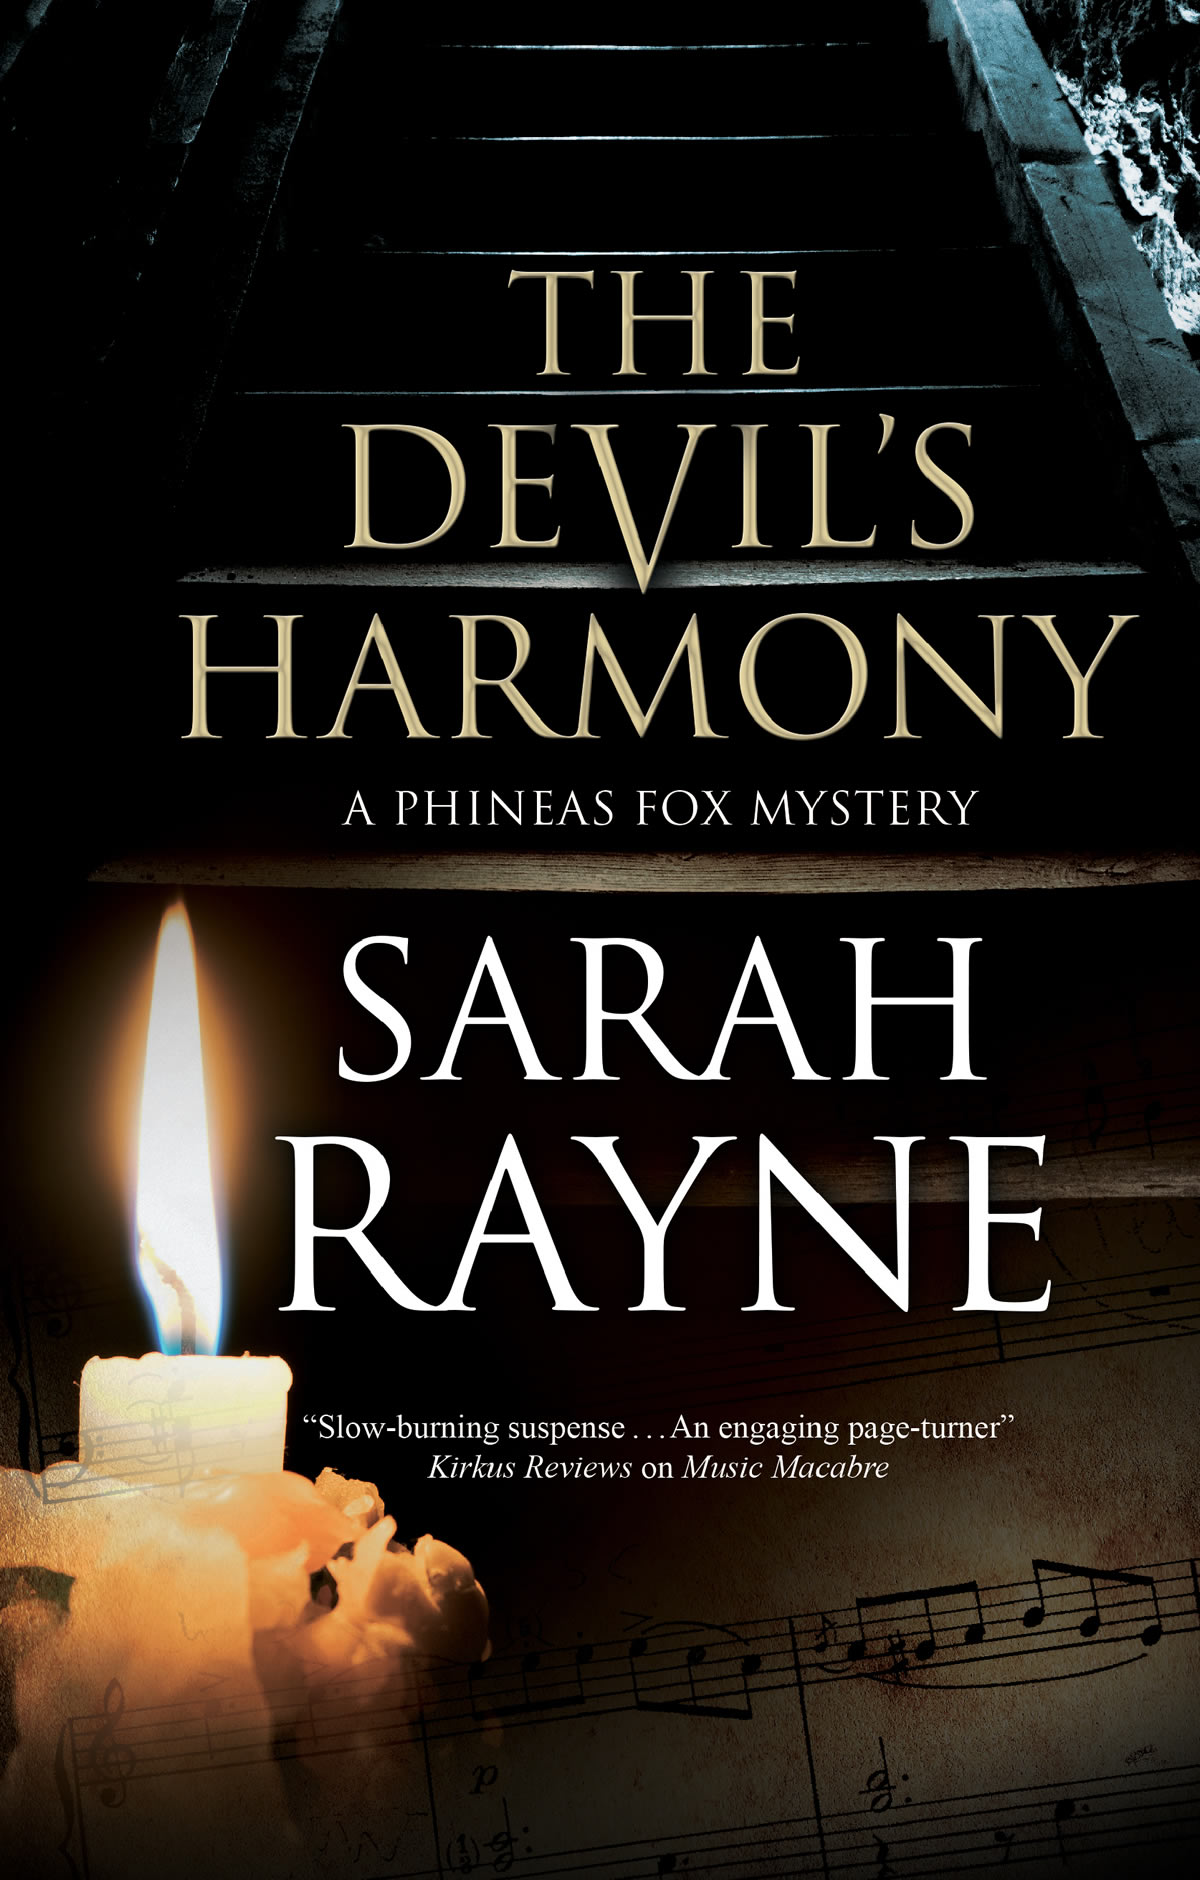 The Devil's Harmony by Sarah Rayne